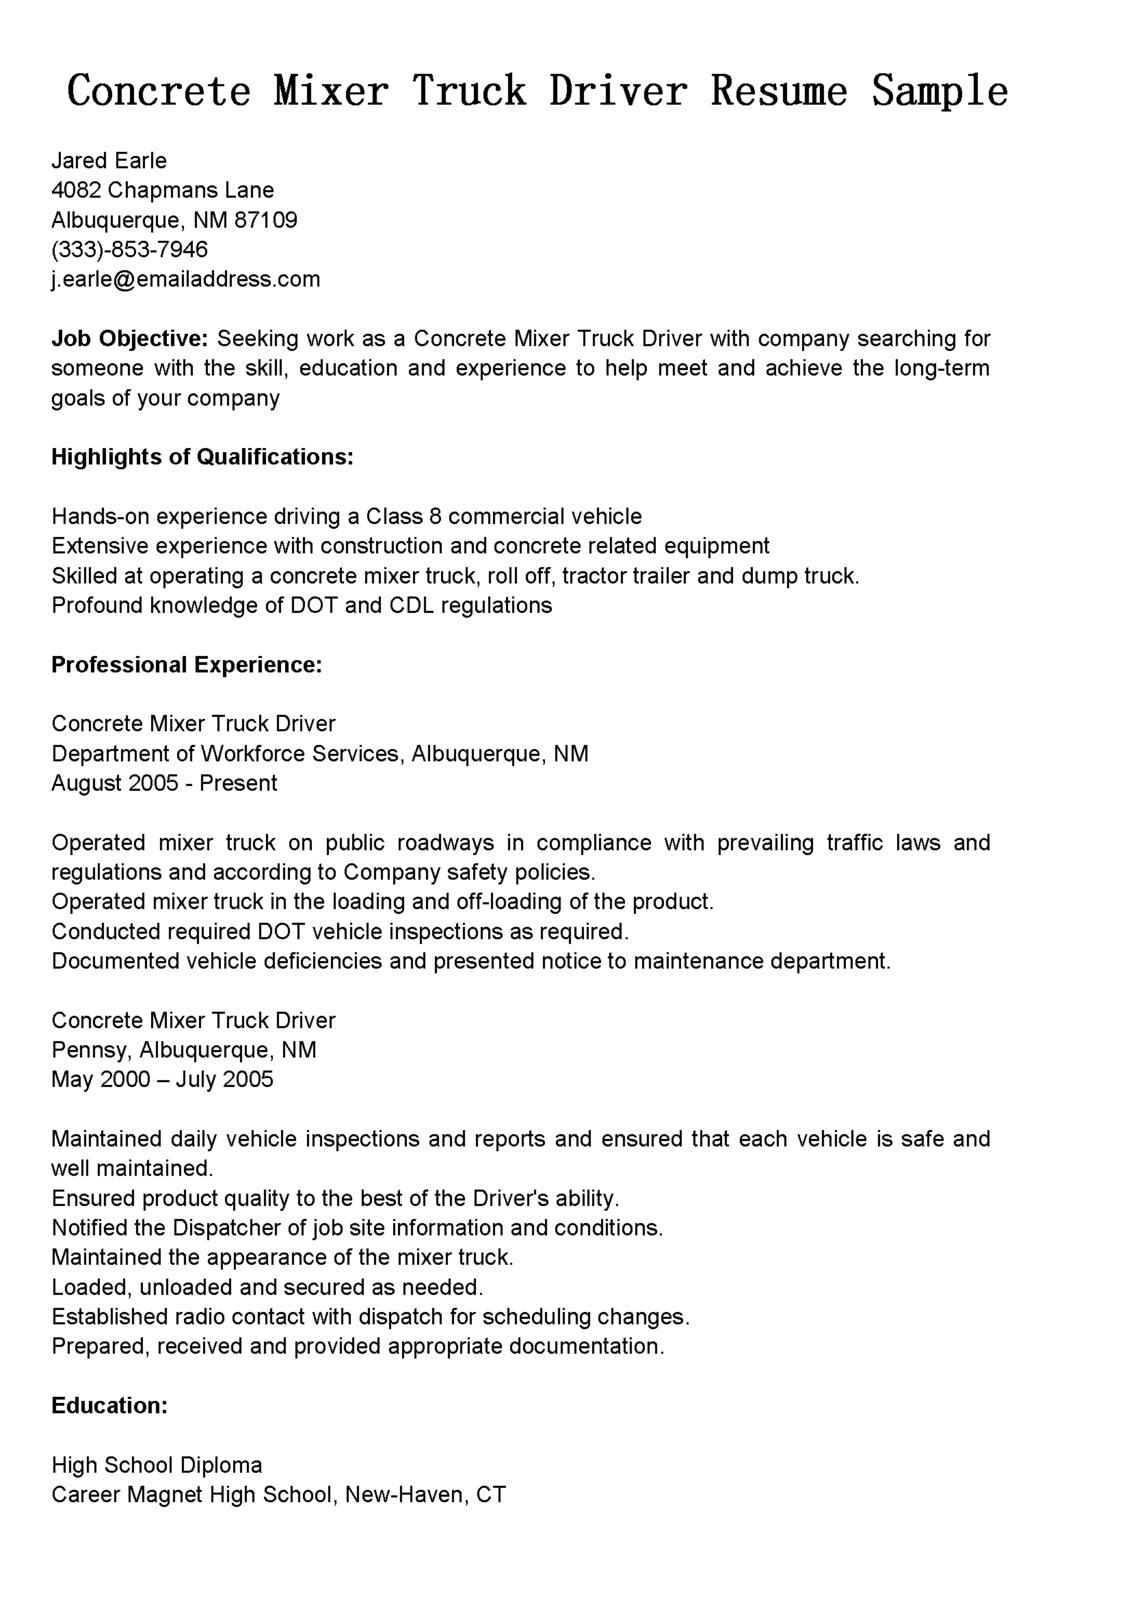 job cover letter driver. sample resume cdl driver cdl truck driver ...